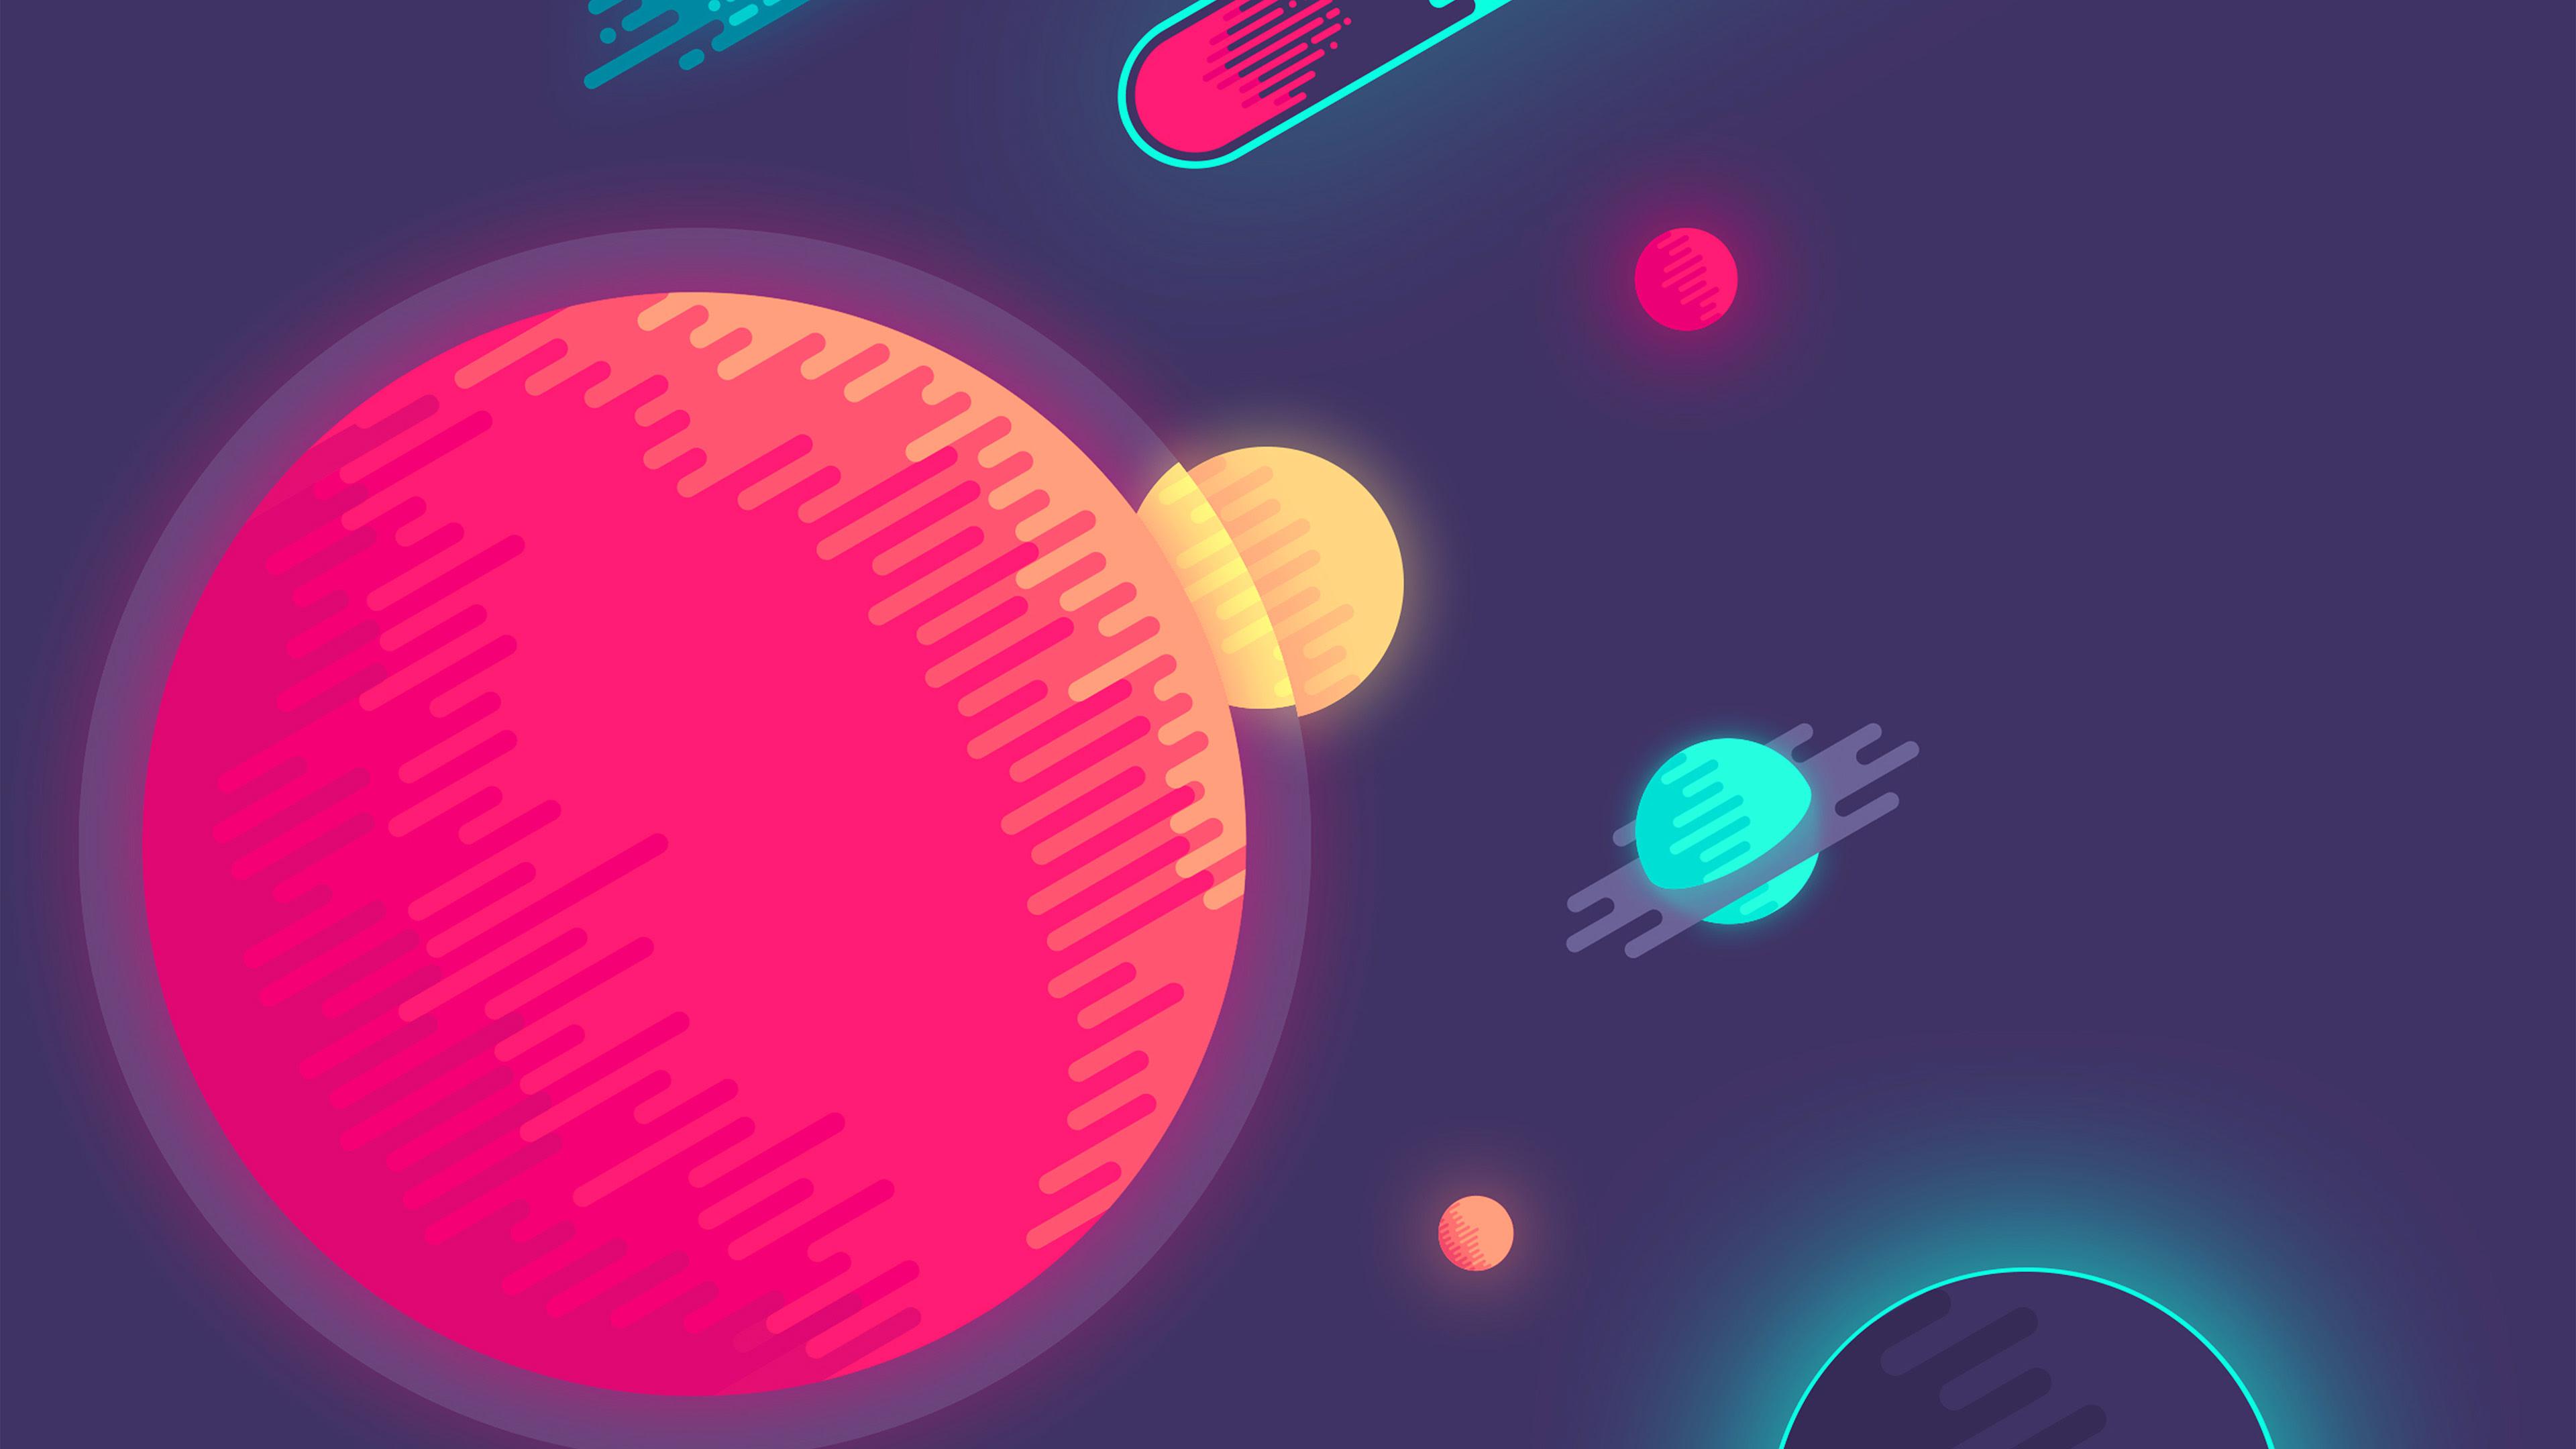 wallpaper for desktop, laptop   as10-space-minimal-art ...